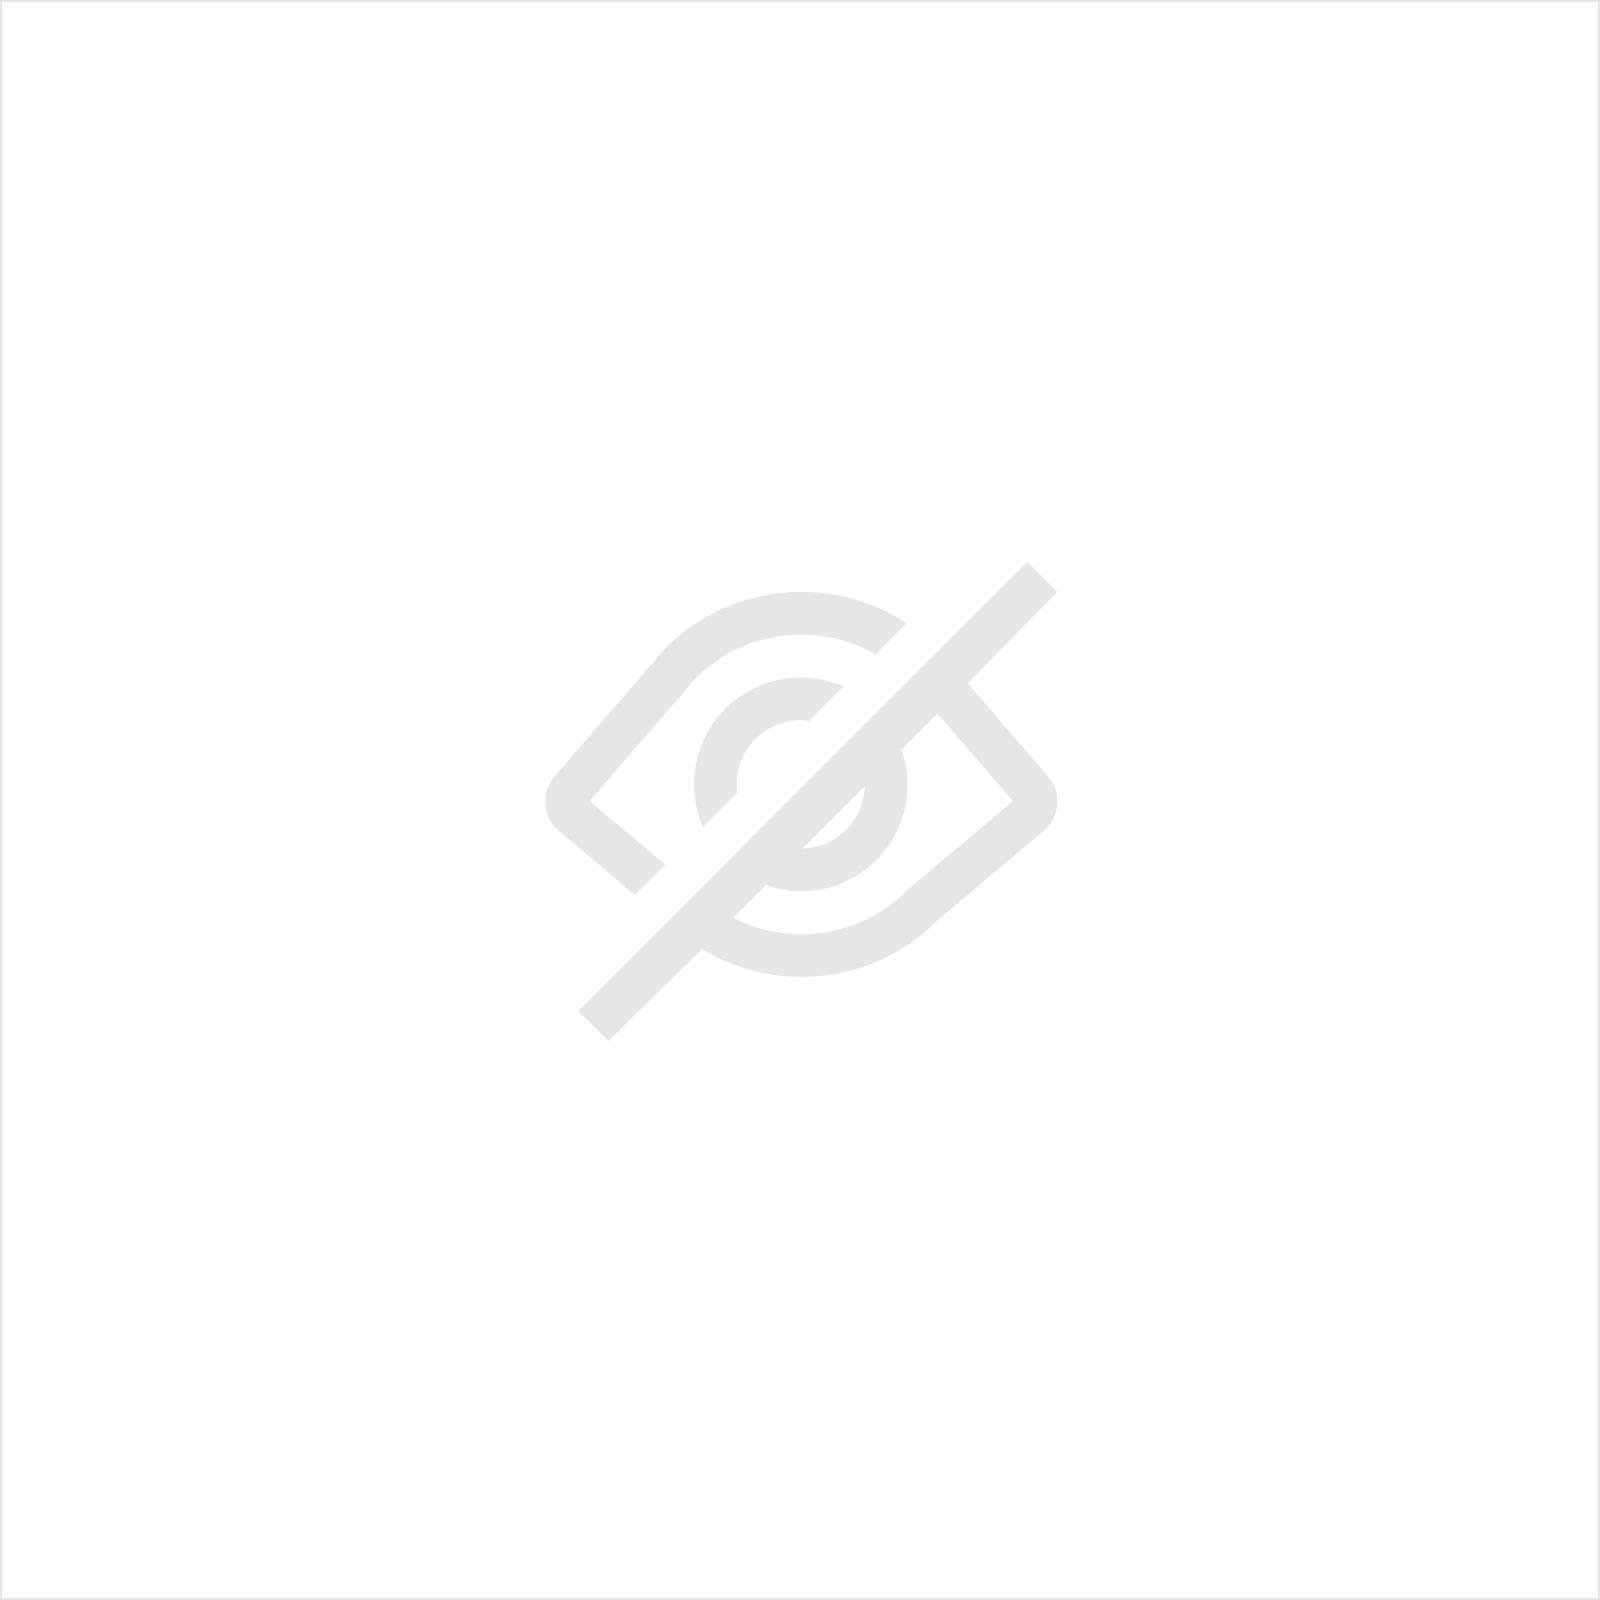 HEAVY DUTY WERKPLAATSINRICHTING MODULE-03